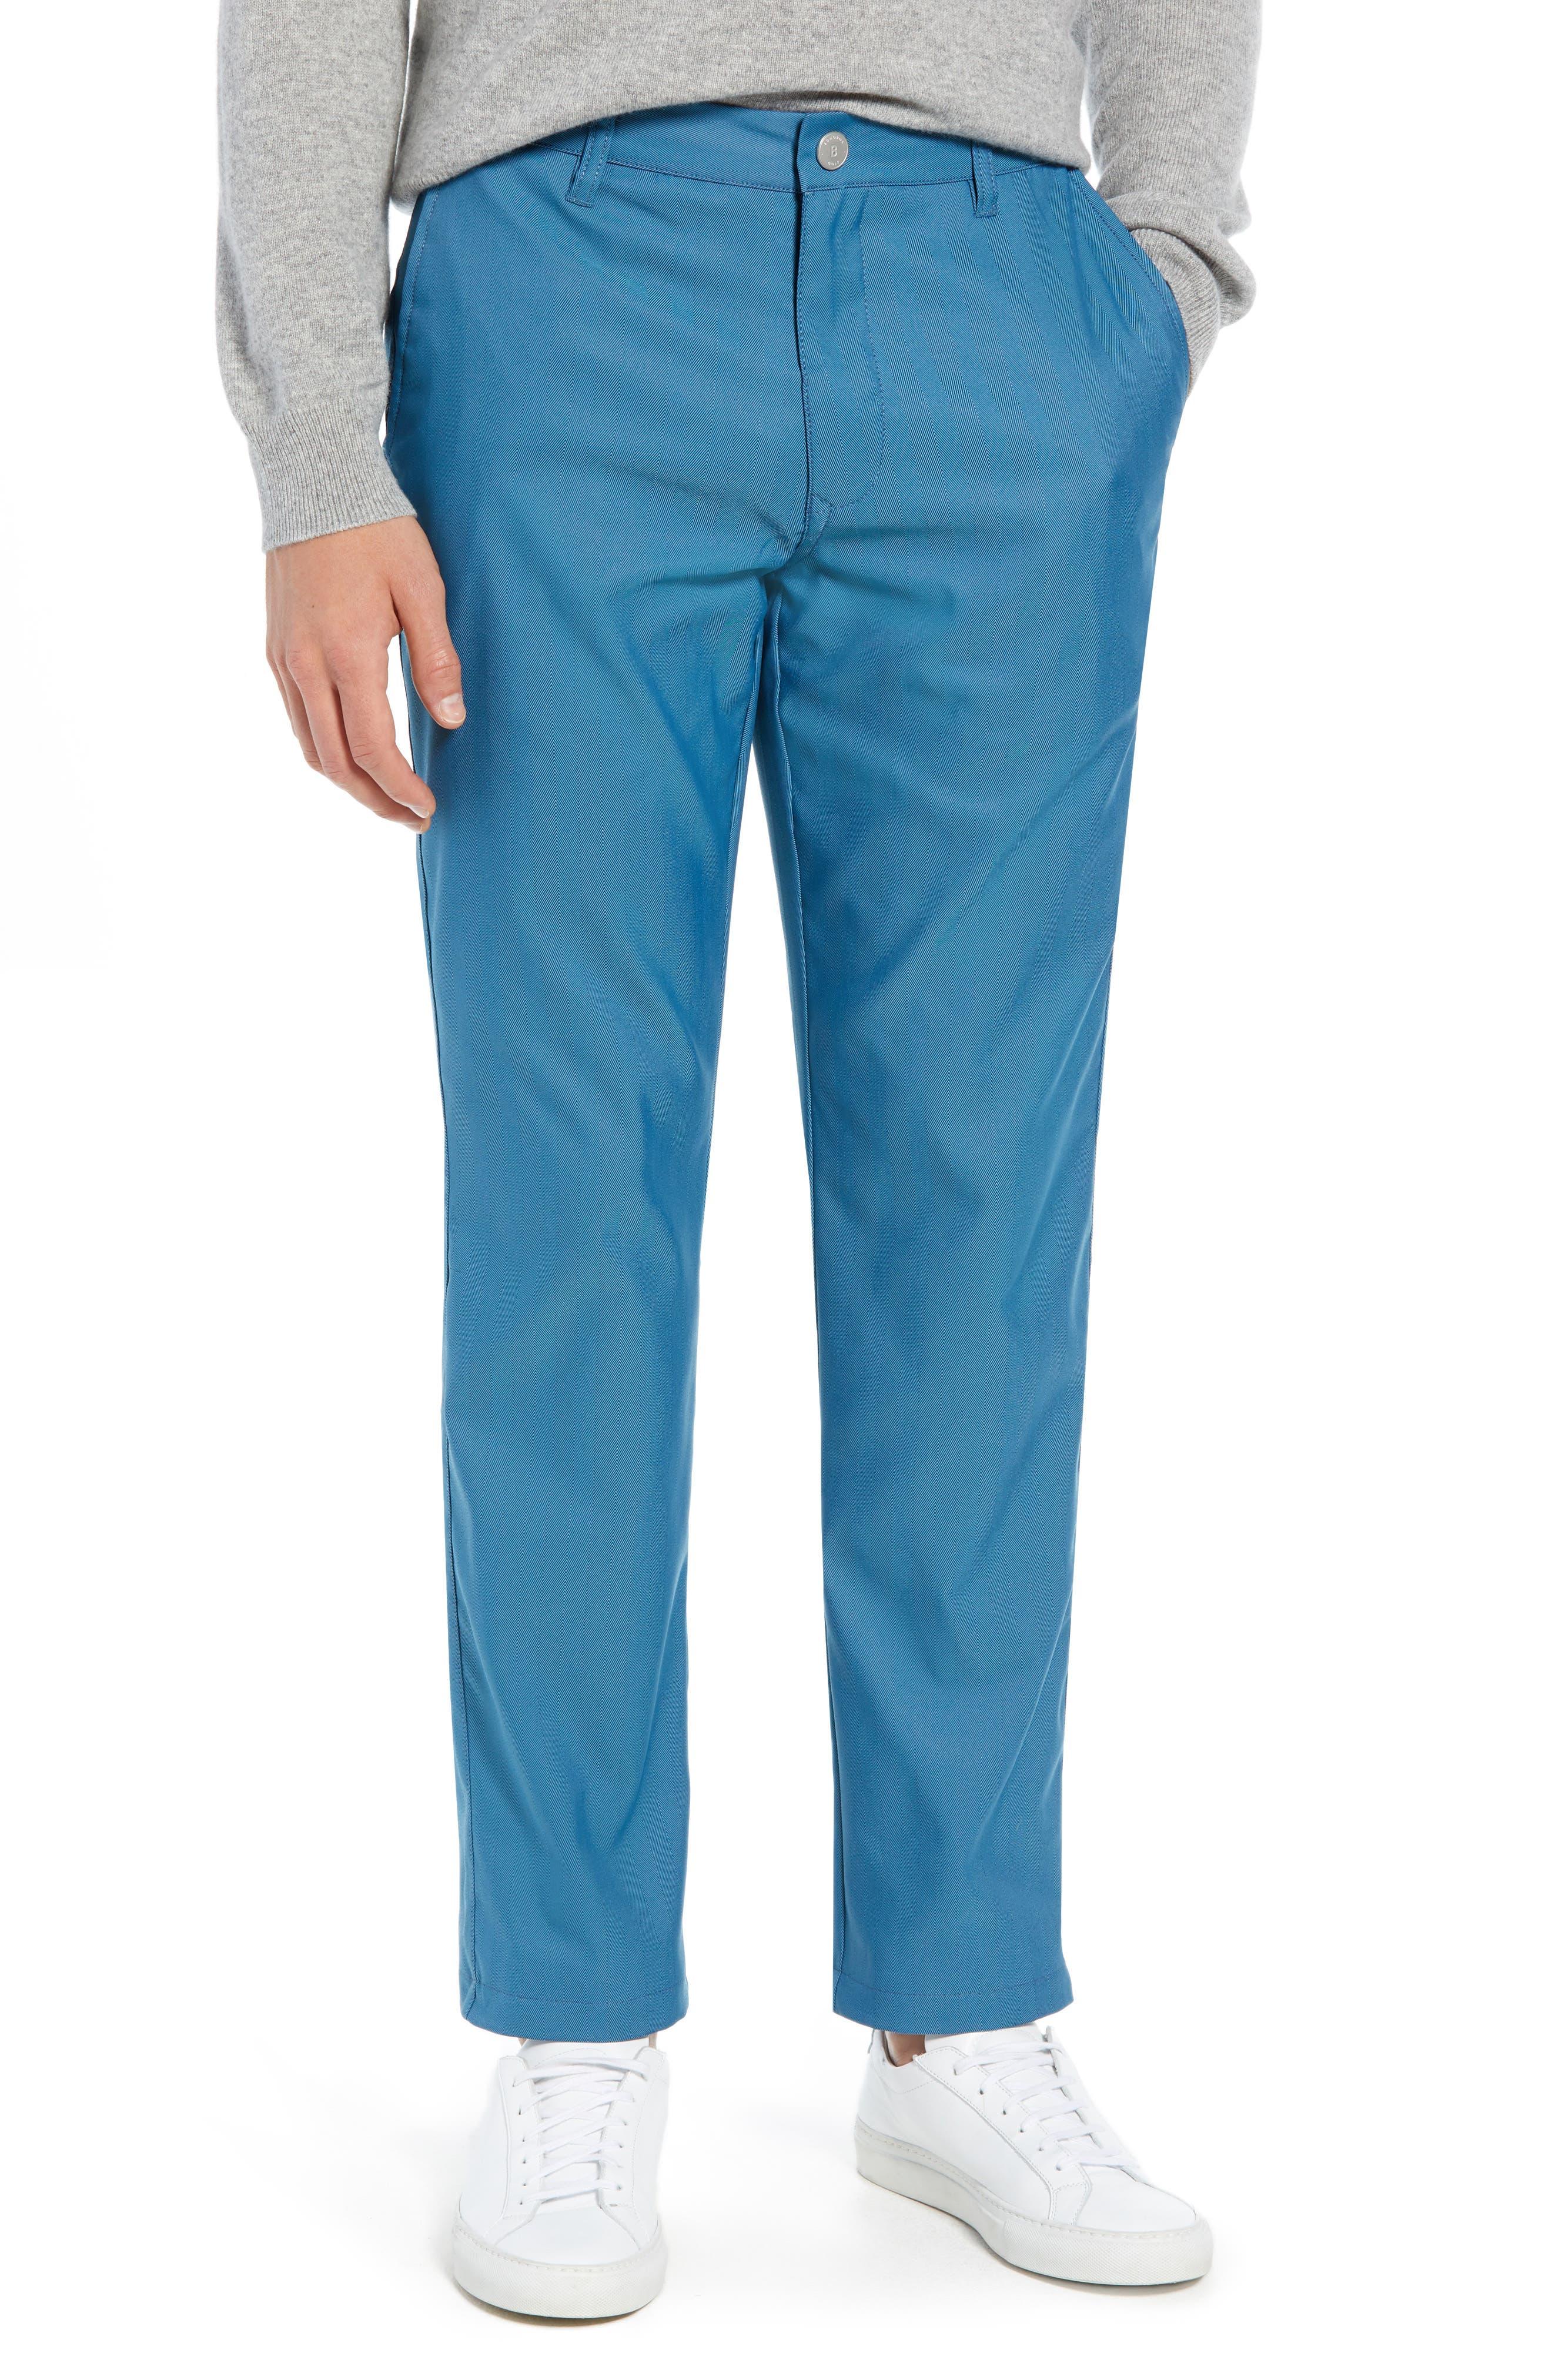 Highland Slim Fit Golf Pants,                         Main,                         color, 400